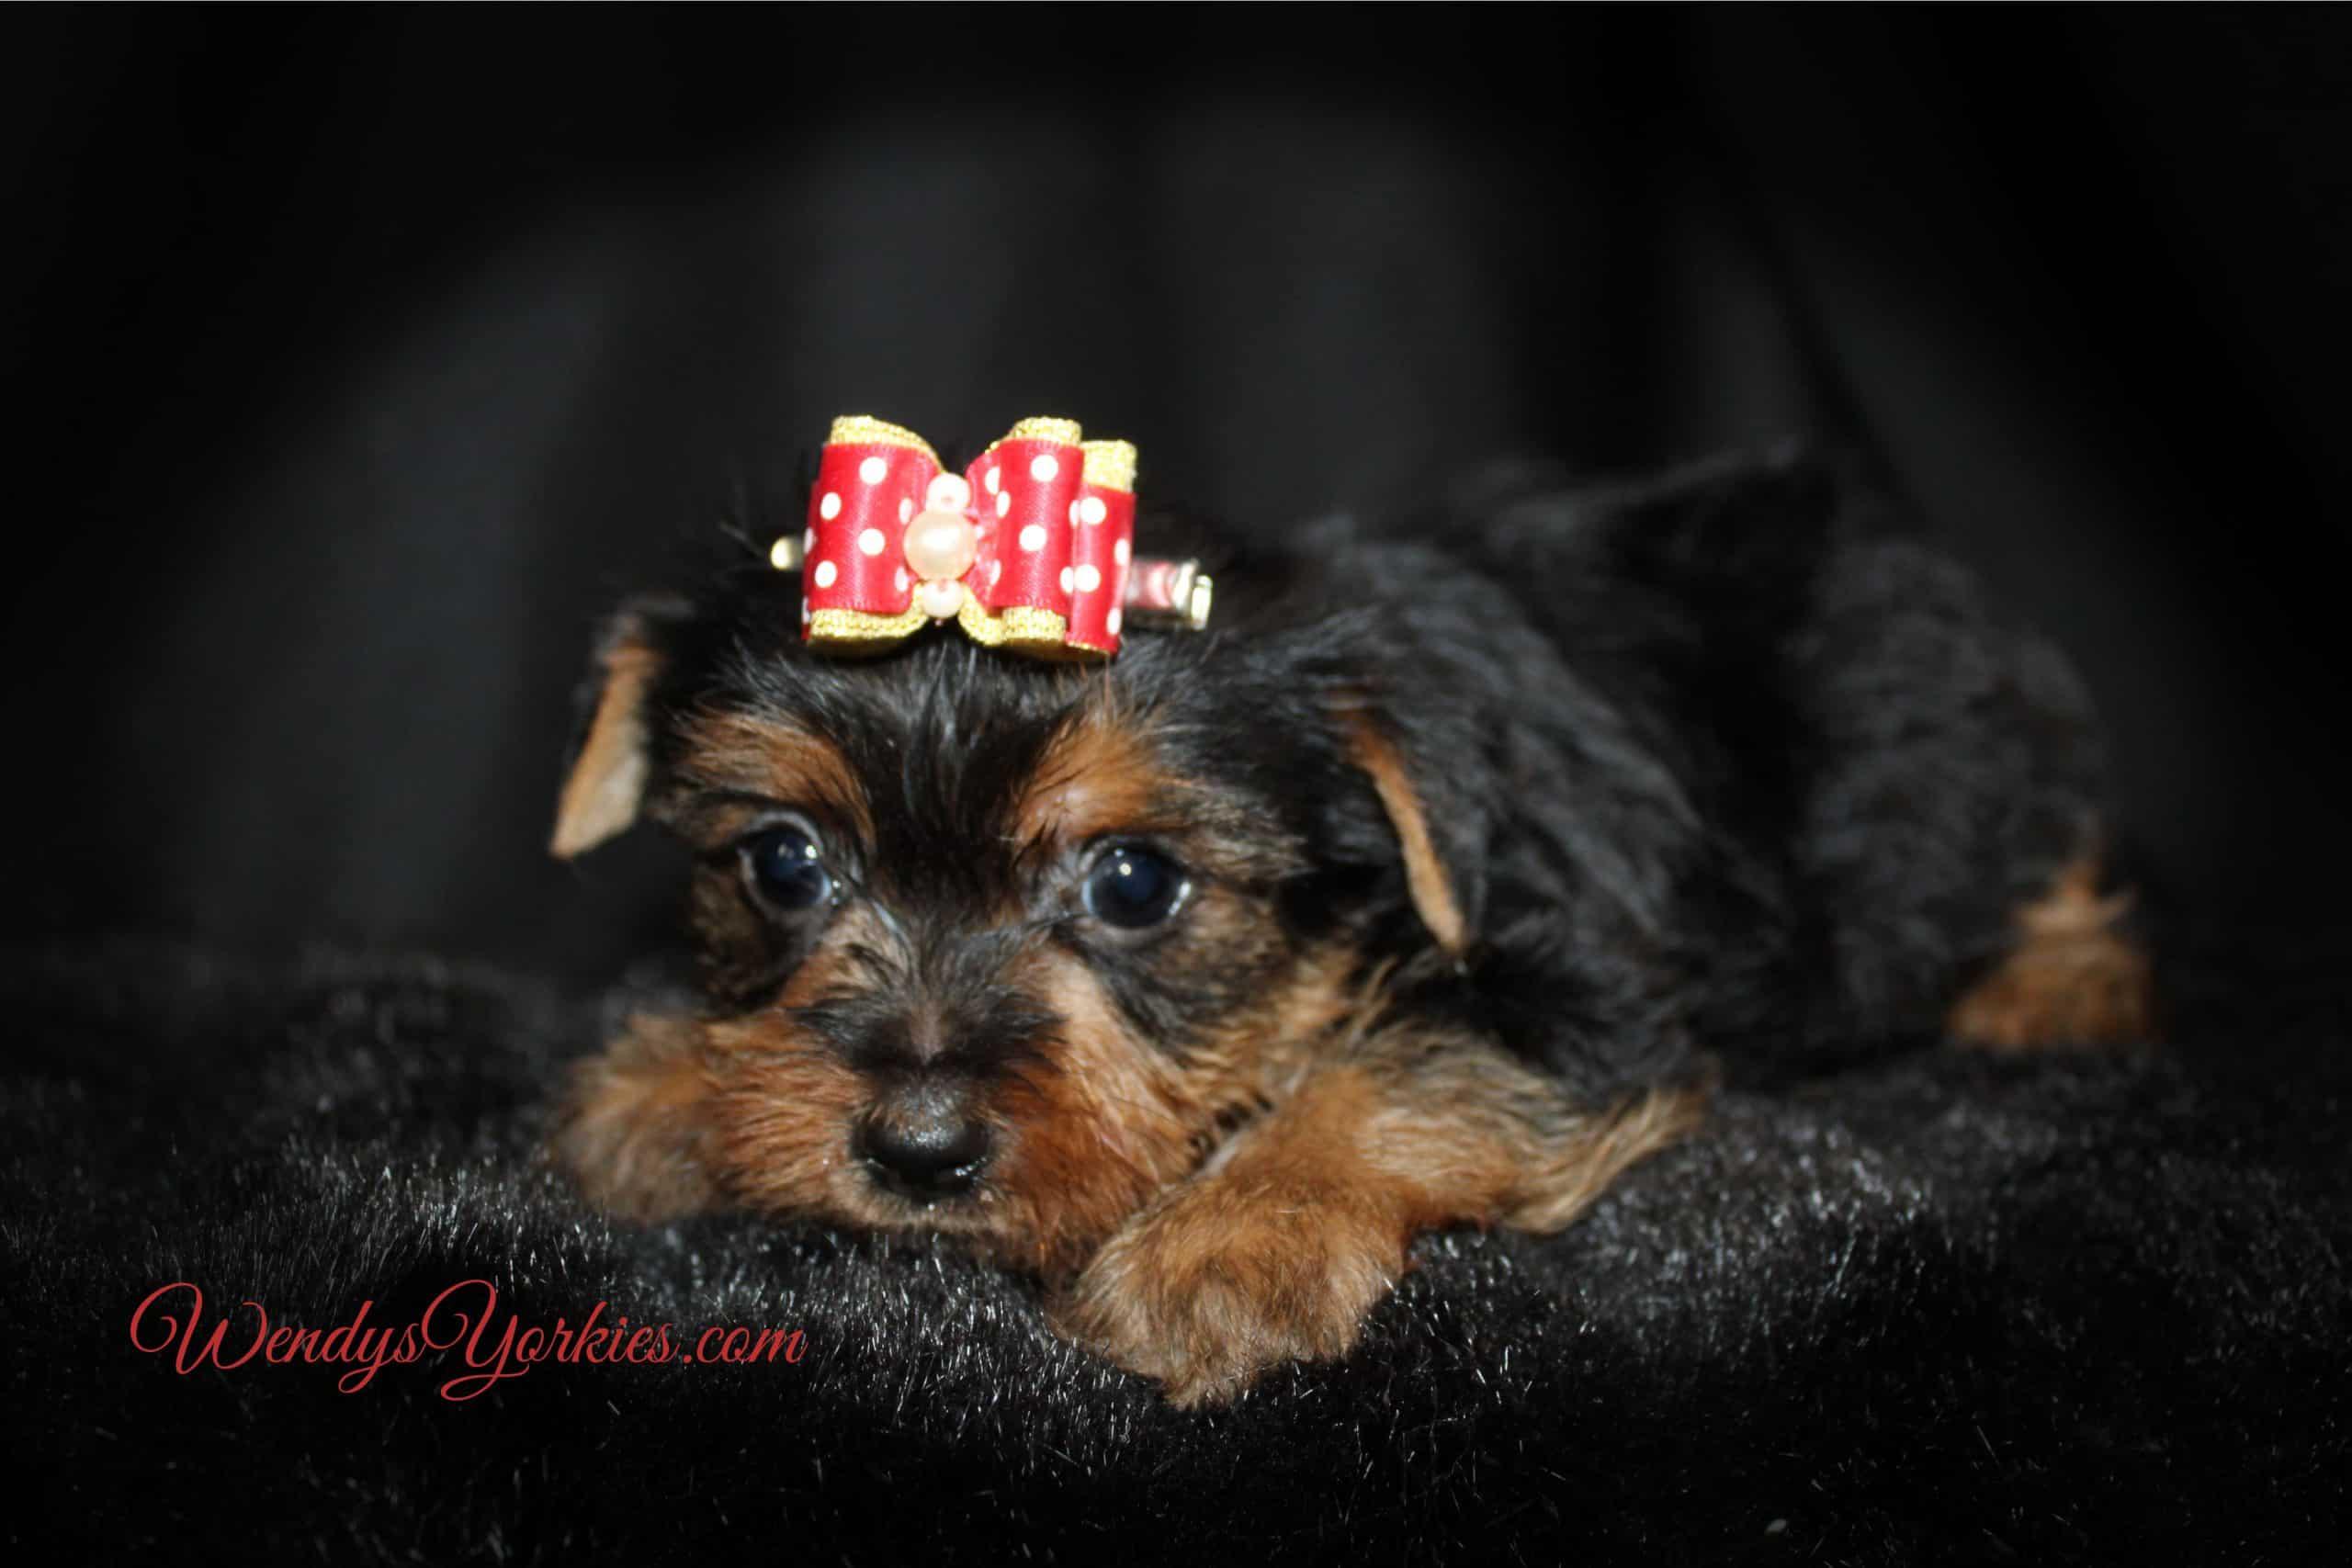 Yorkie puppy for sale, Mercedes m1, WendysYorkies.com